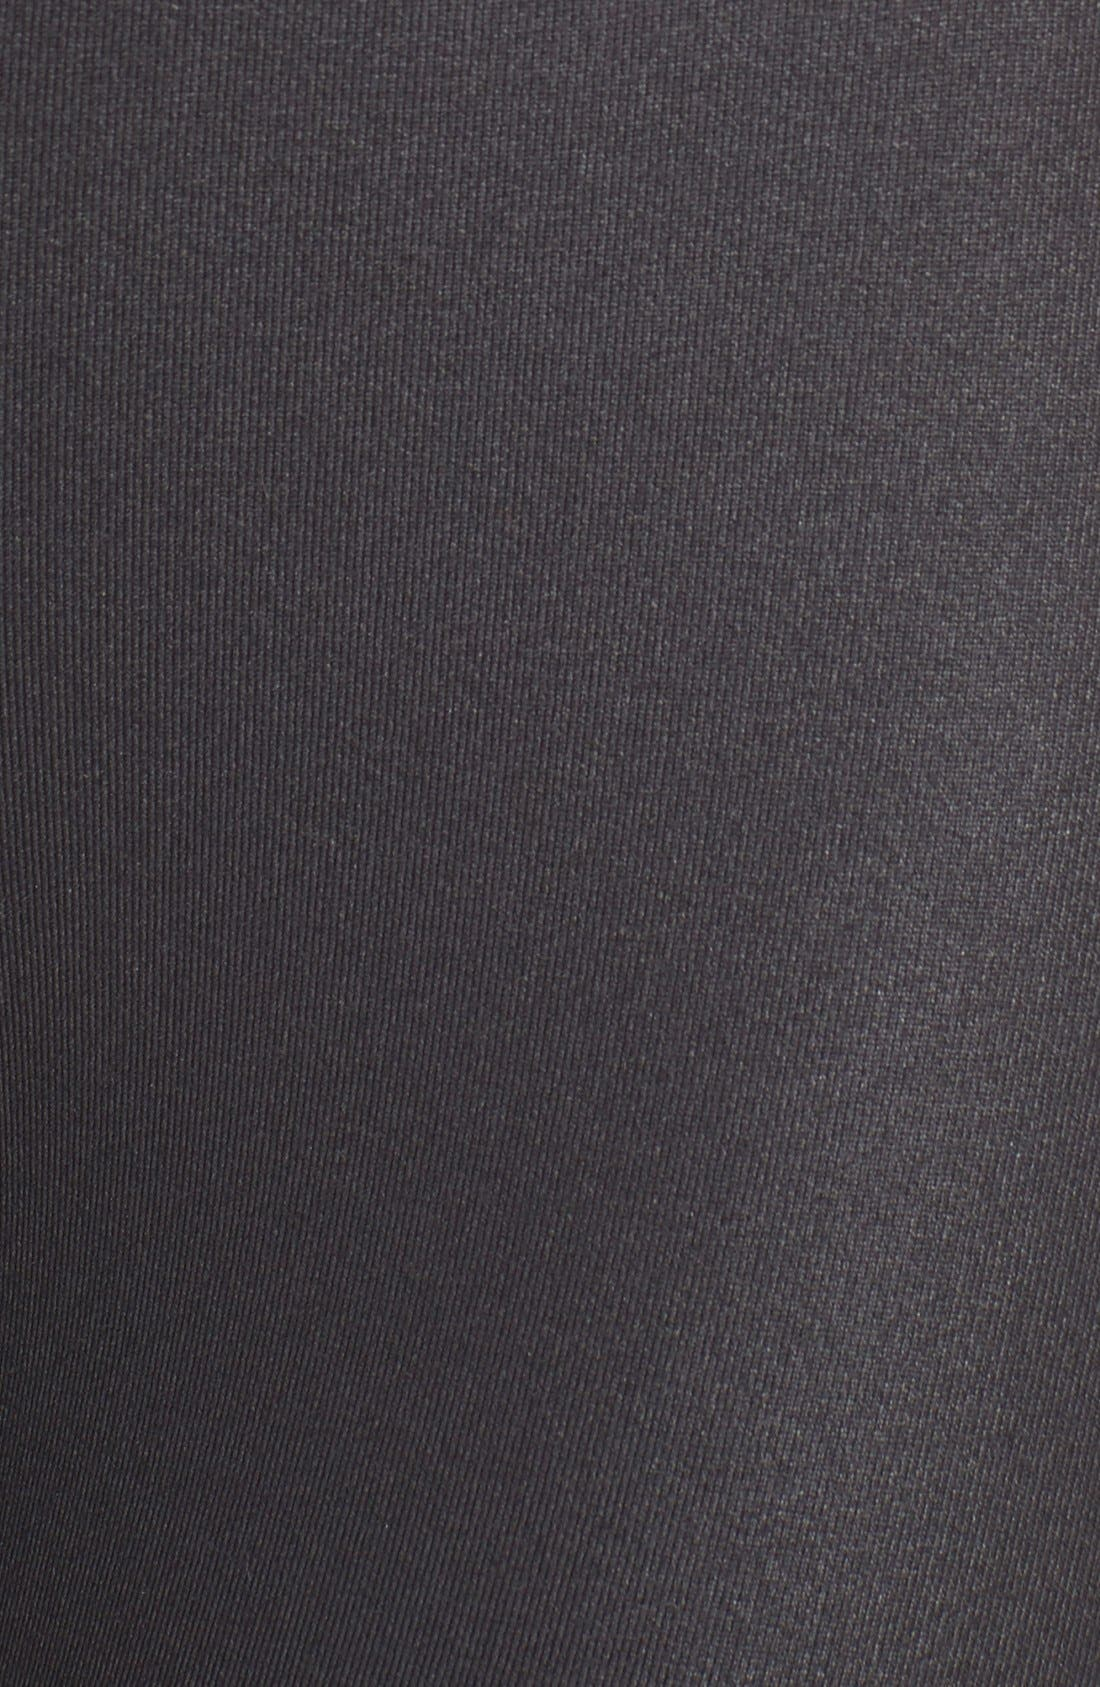 High Waist Airbrush Capris,                             Alternate thumbnail 7, color,                             Black Glossy